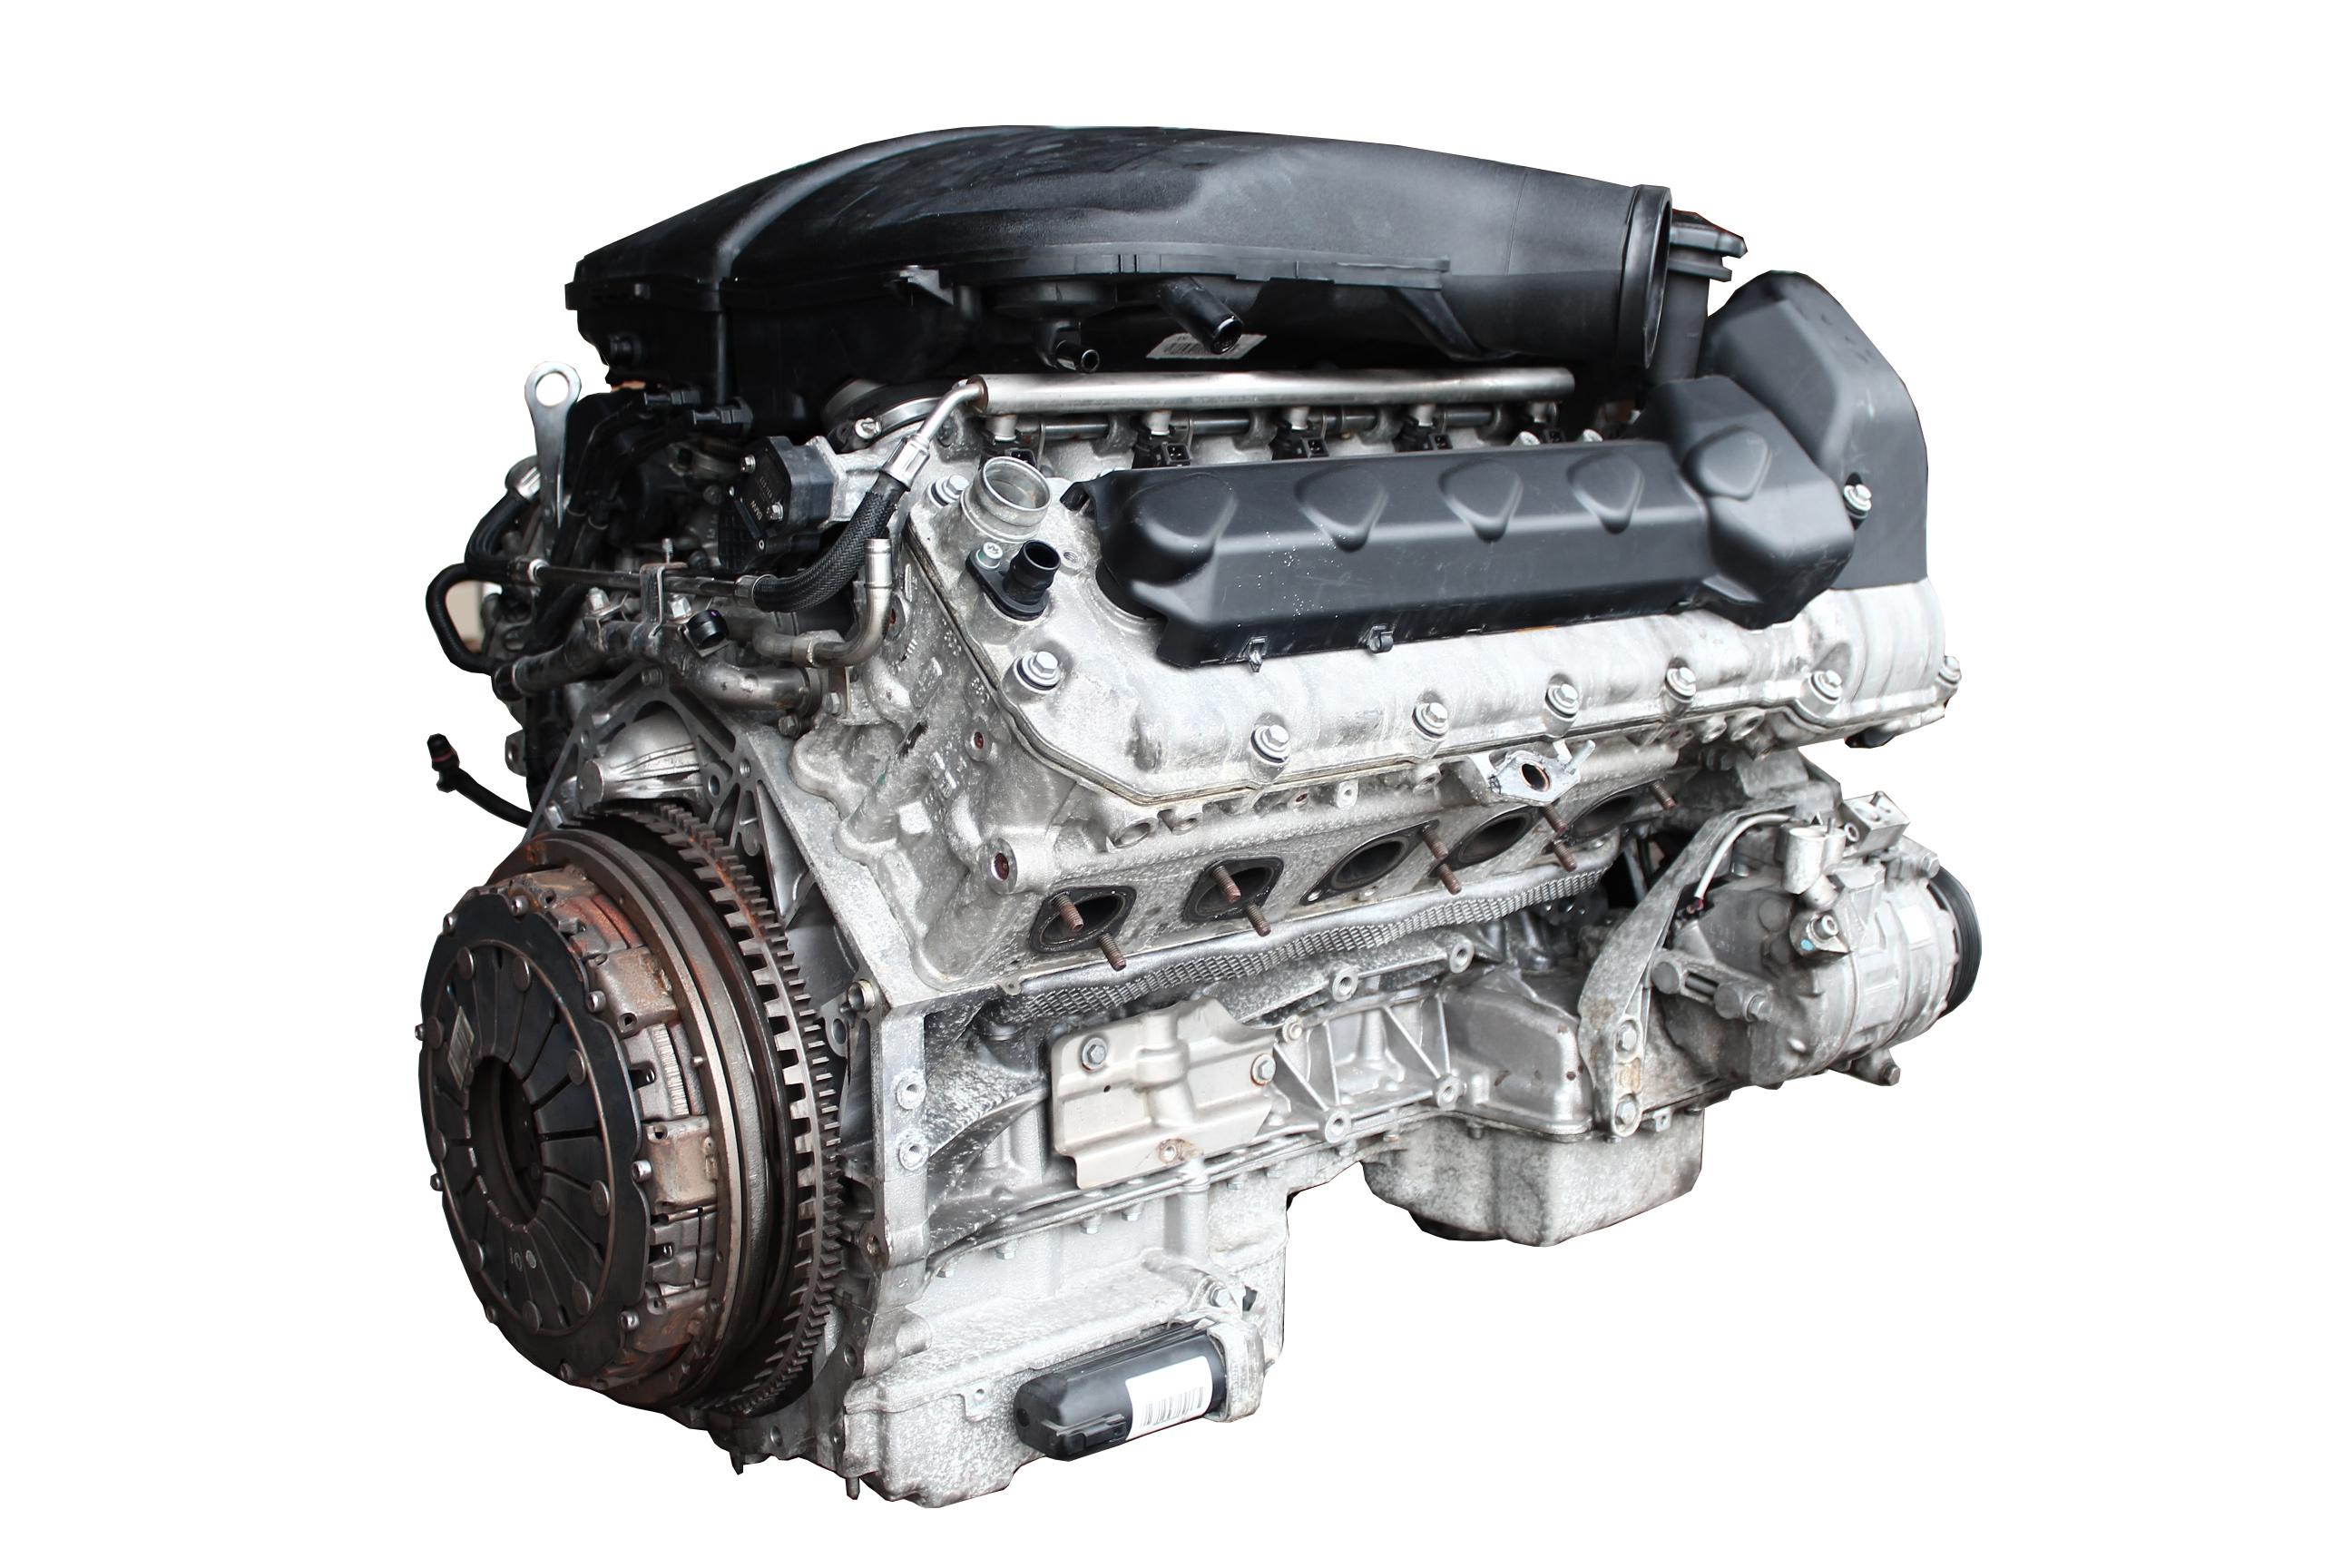 Motor 2006 BMW E60 E61 E63 E64 M5 5,0 S85B50A S85 S85B50 507 PS